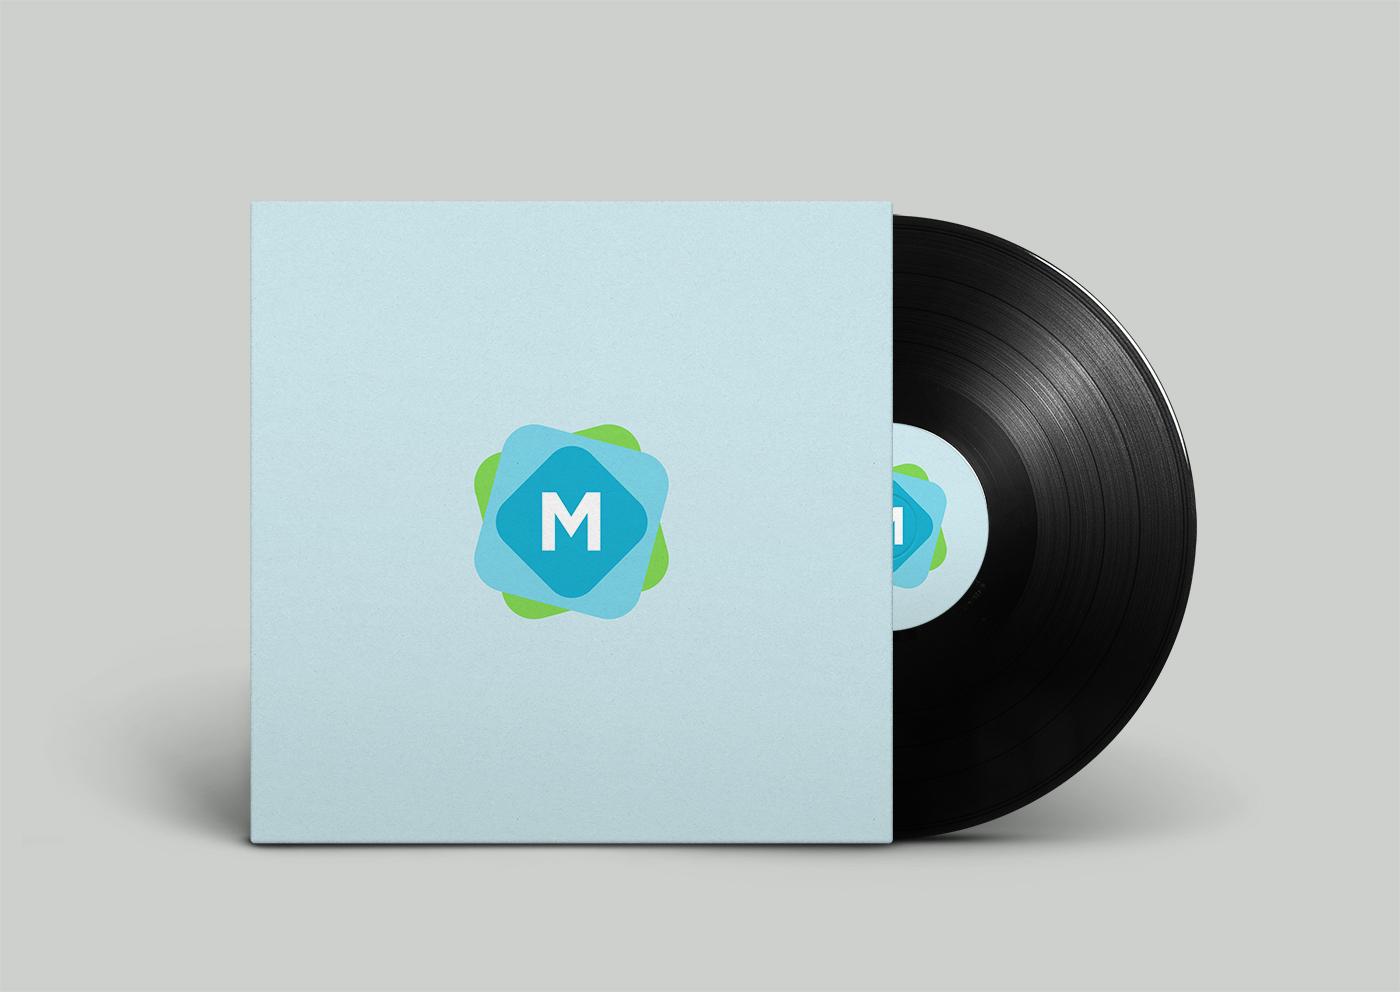 Vinyl Record Cover Mockup - Mockup Templates